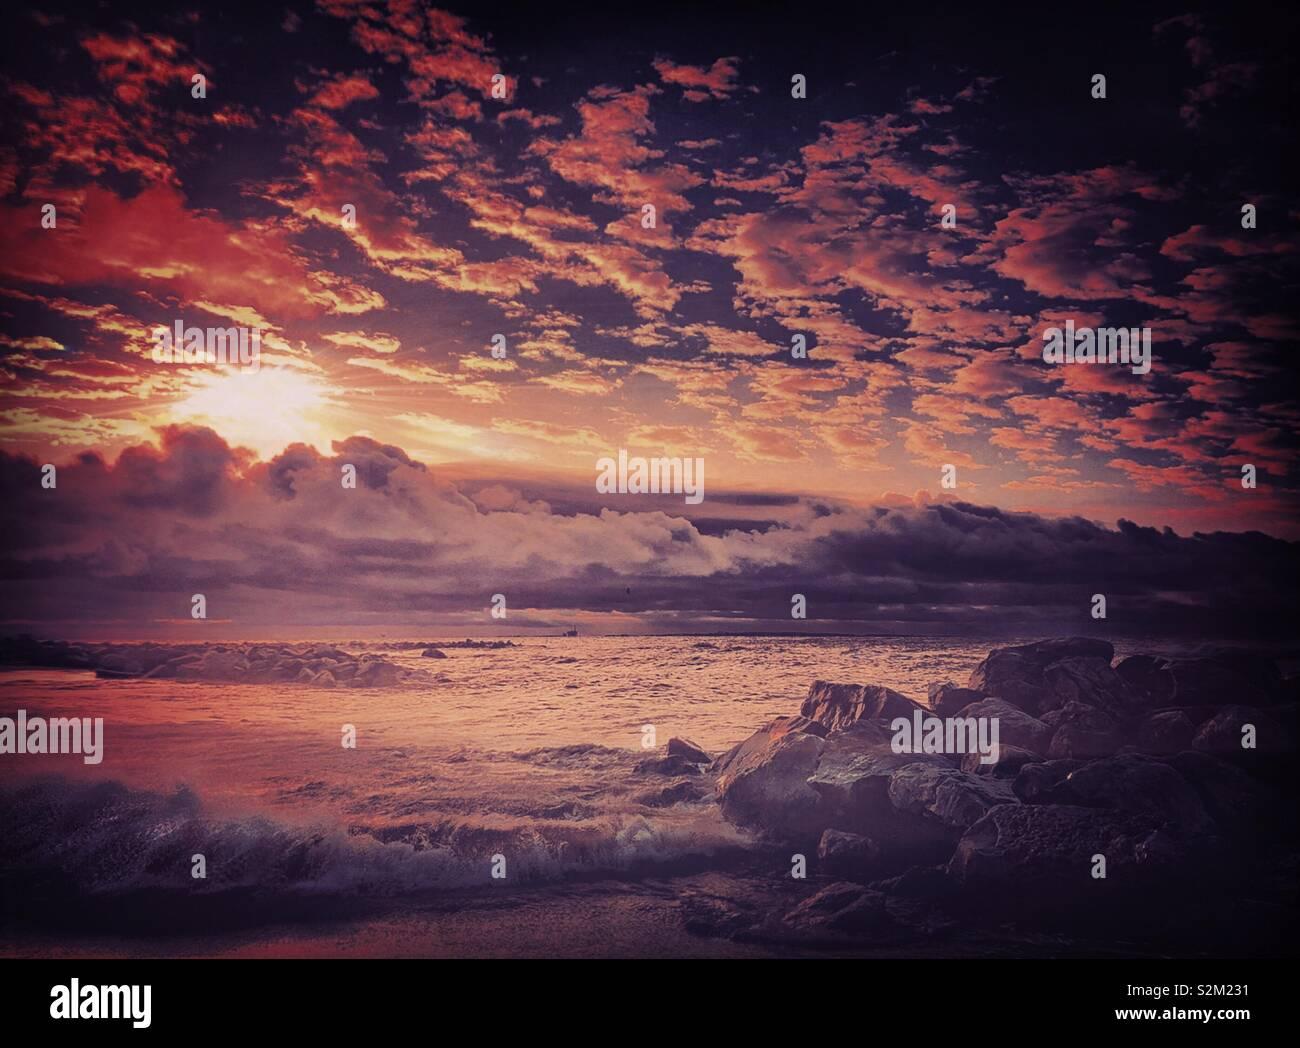 Karfreitag Sonnenaufgang auf Dauphin Island, Alabama. Stockfoto